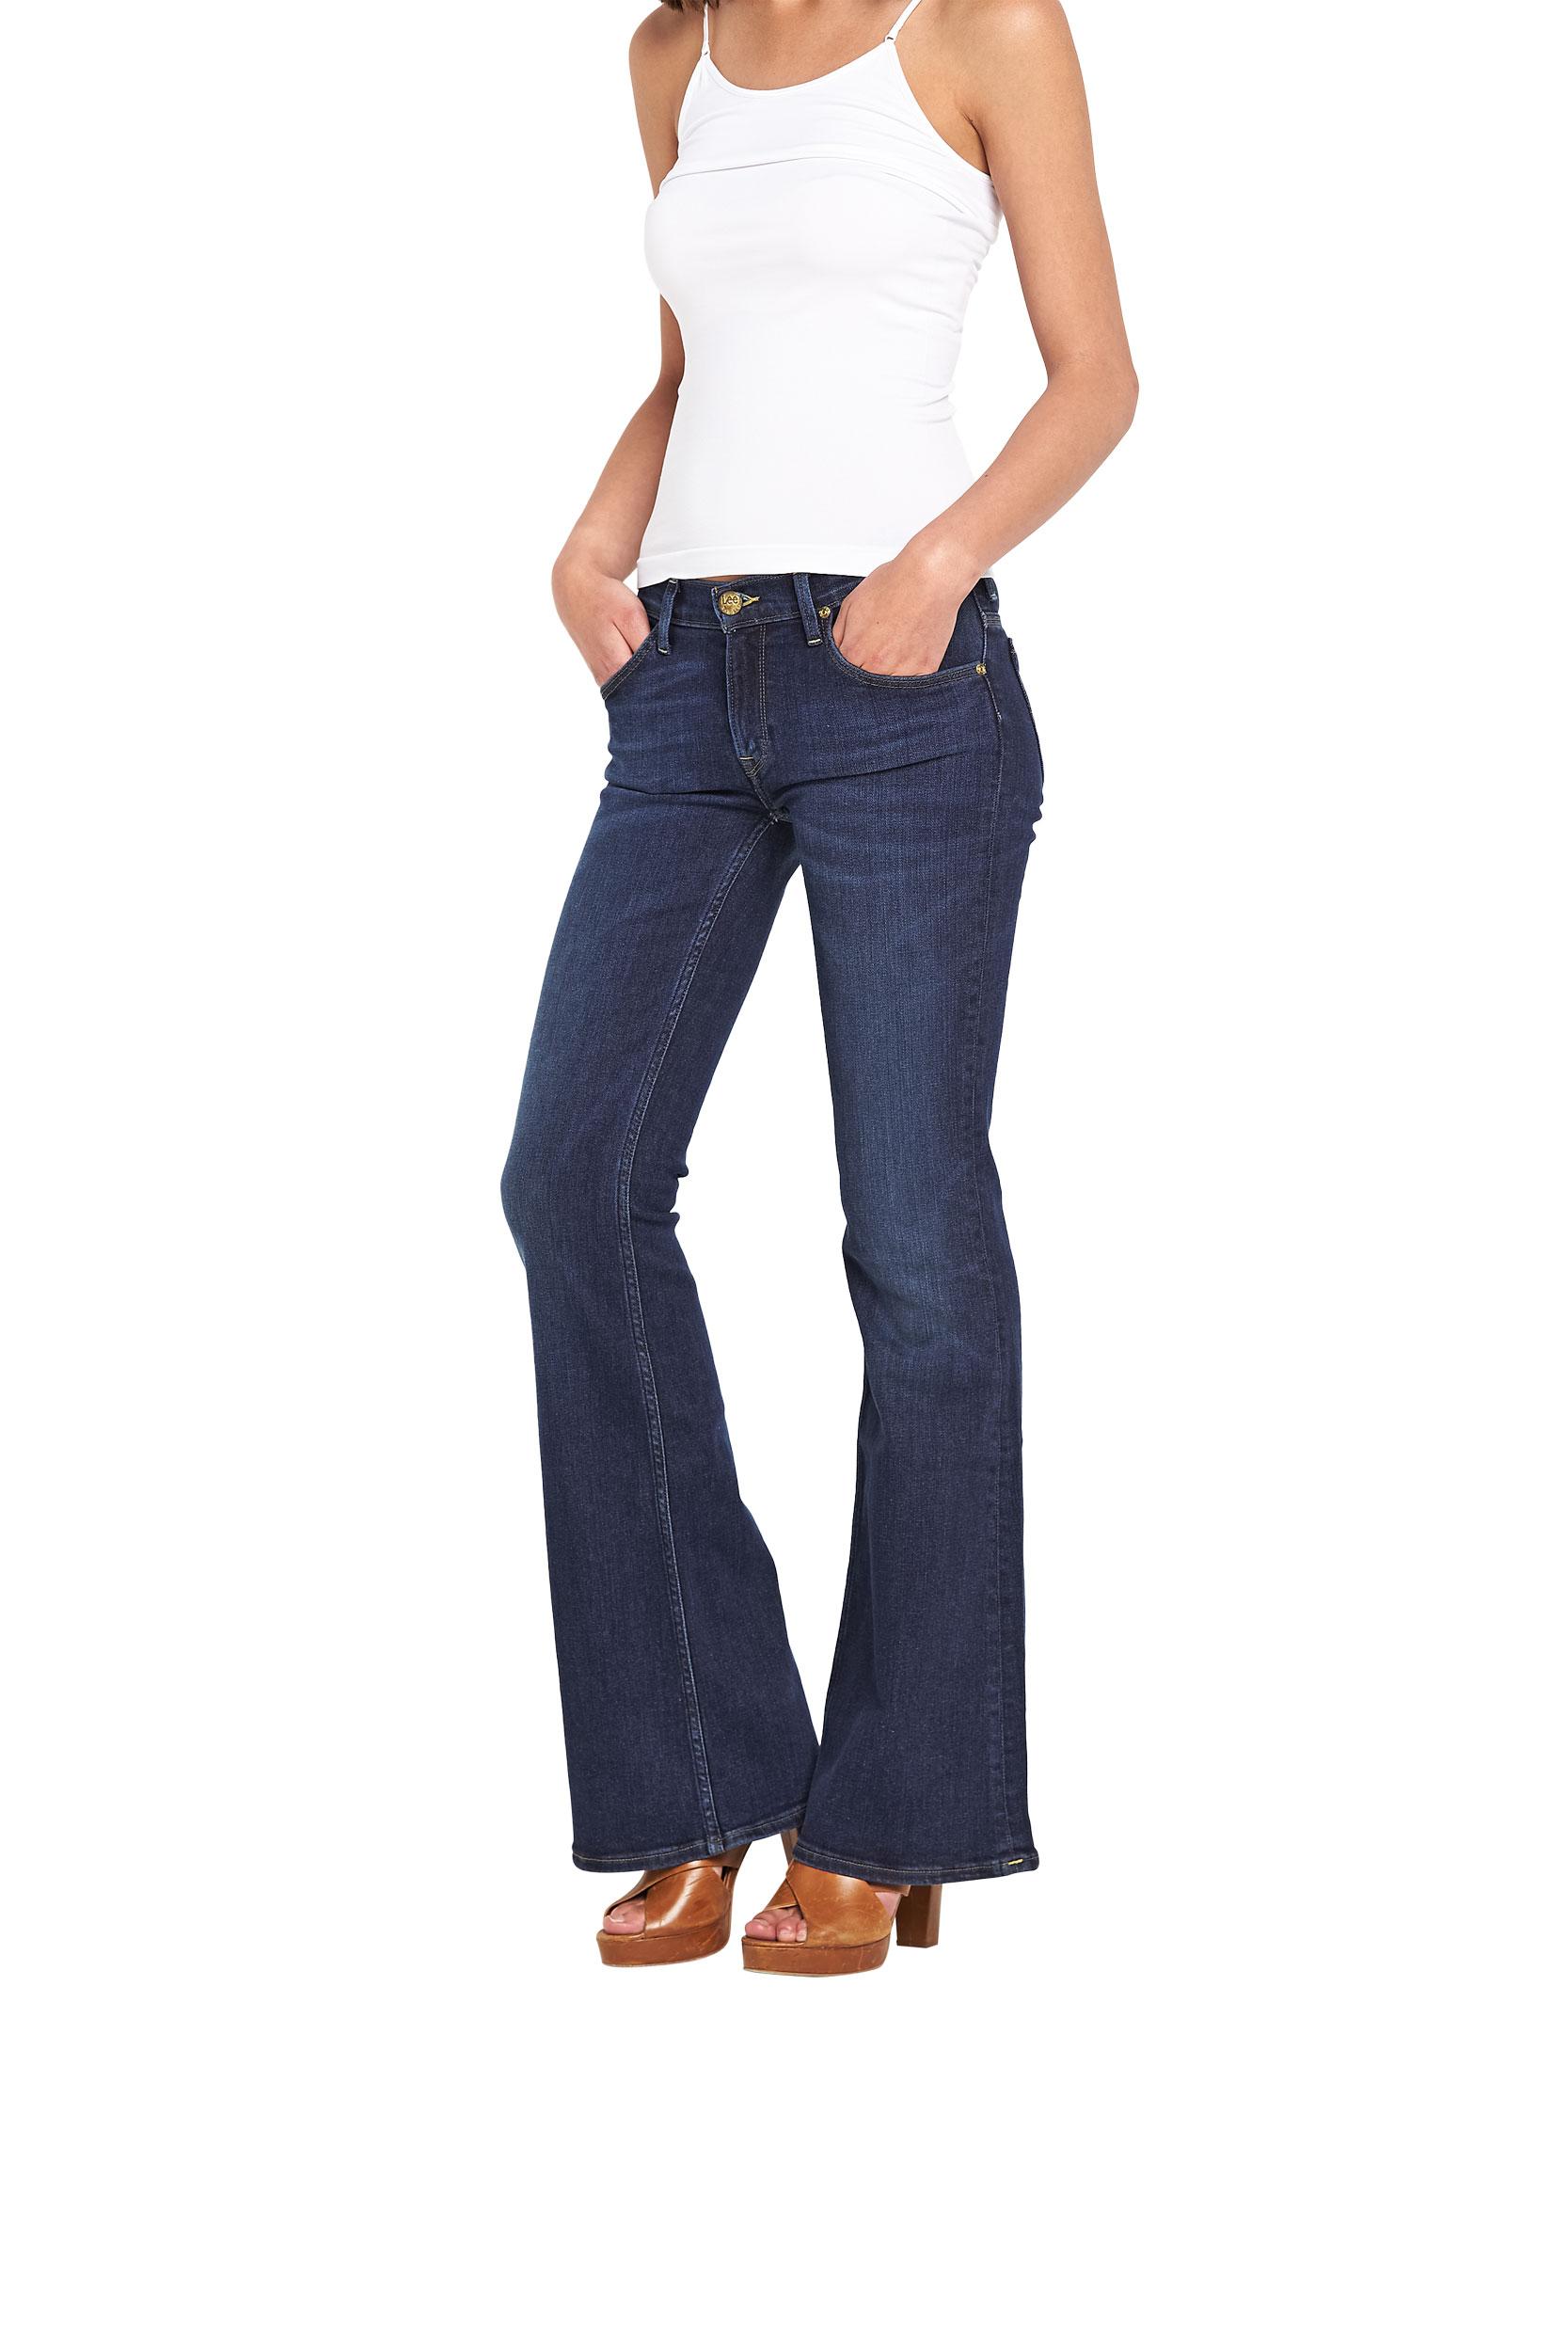 Lee Annetta Flare Leg Jeans